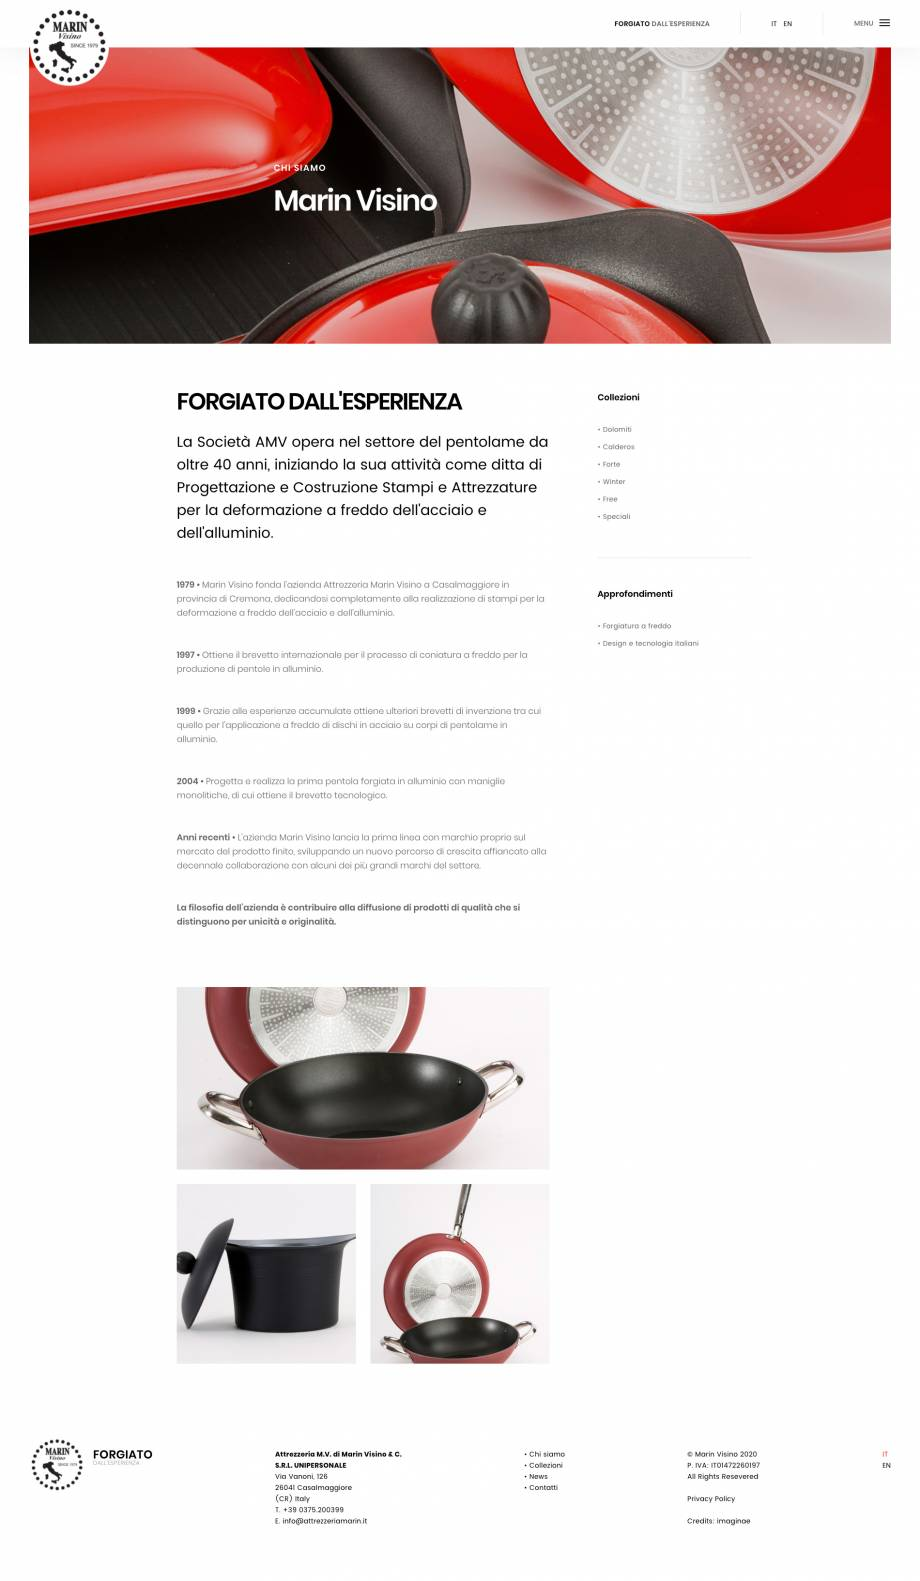 Web Design, Fotografia, Web Site, Still Life, Responsive Smartphone & Tablet,